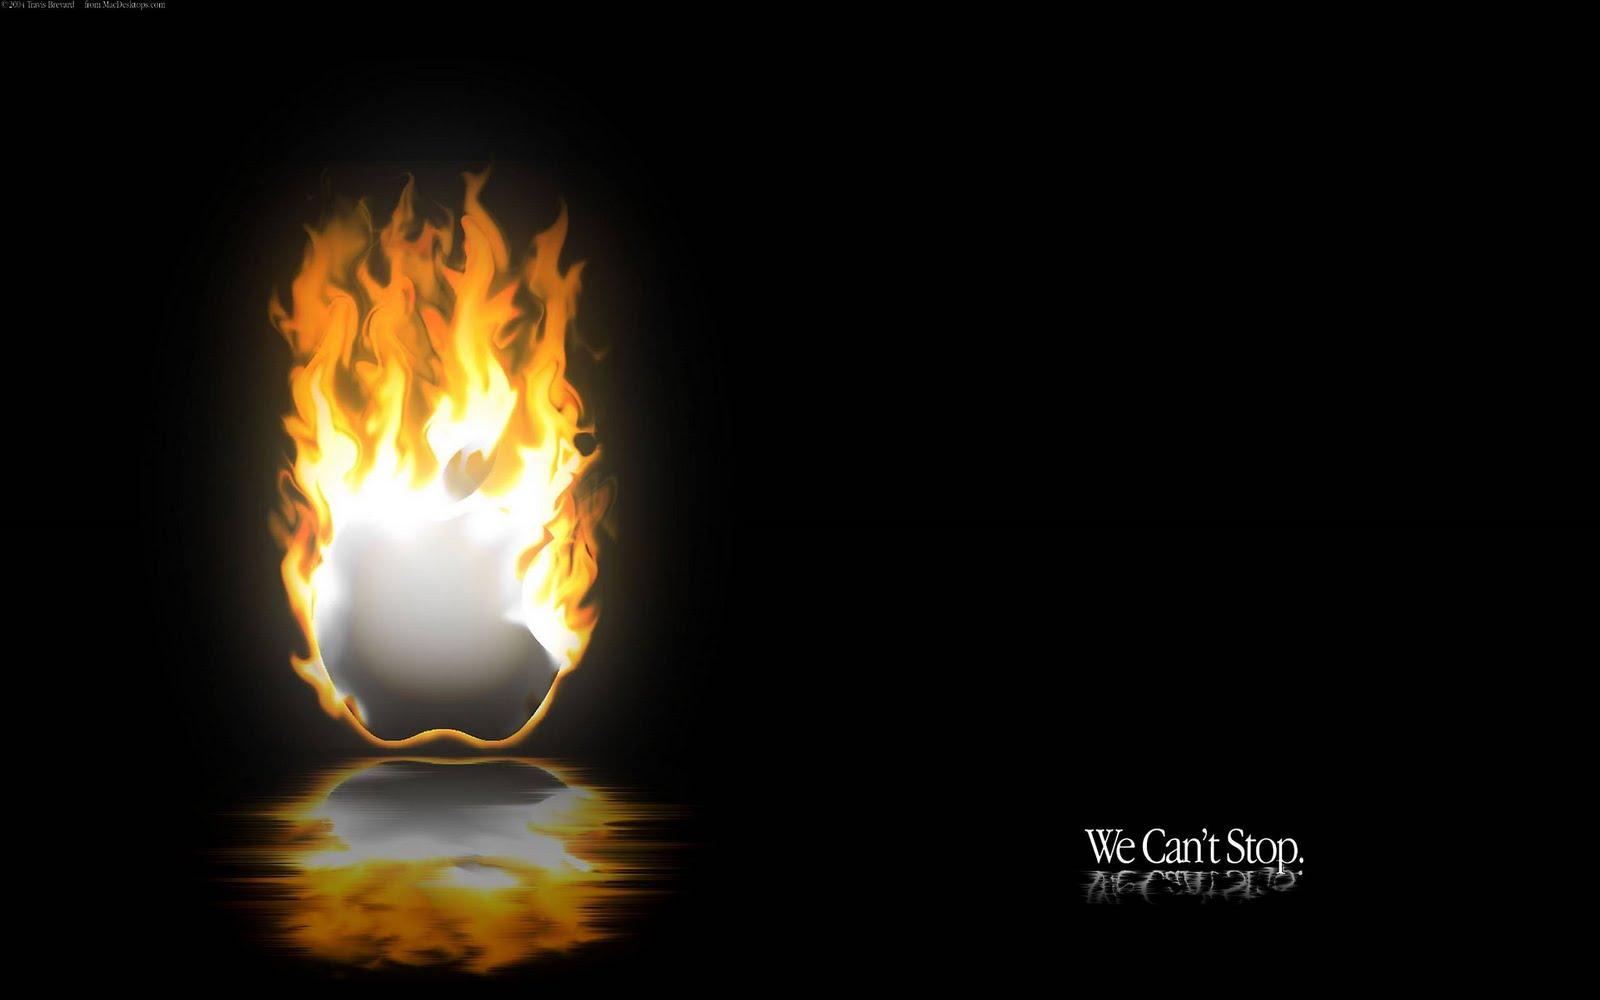 burning apple logo wallpaper